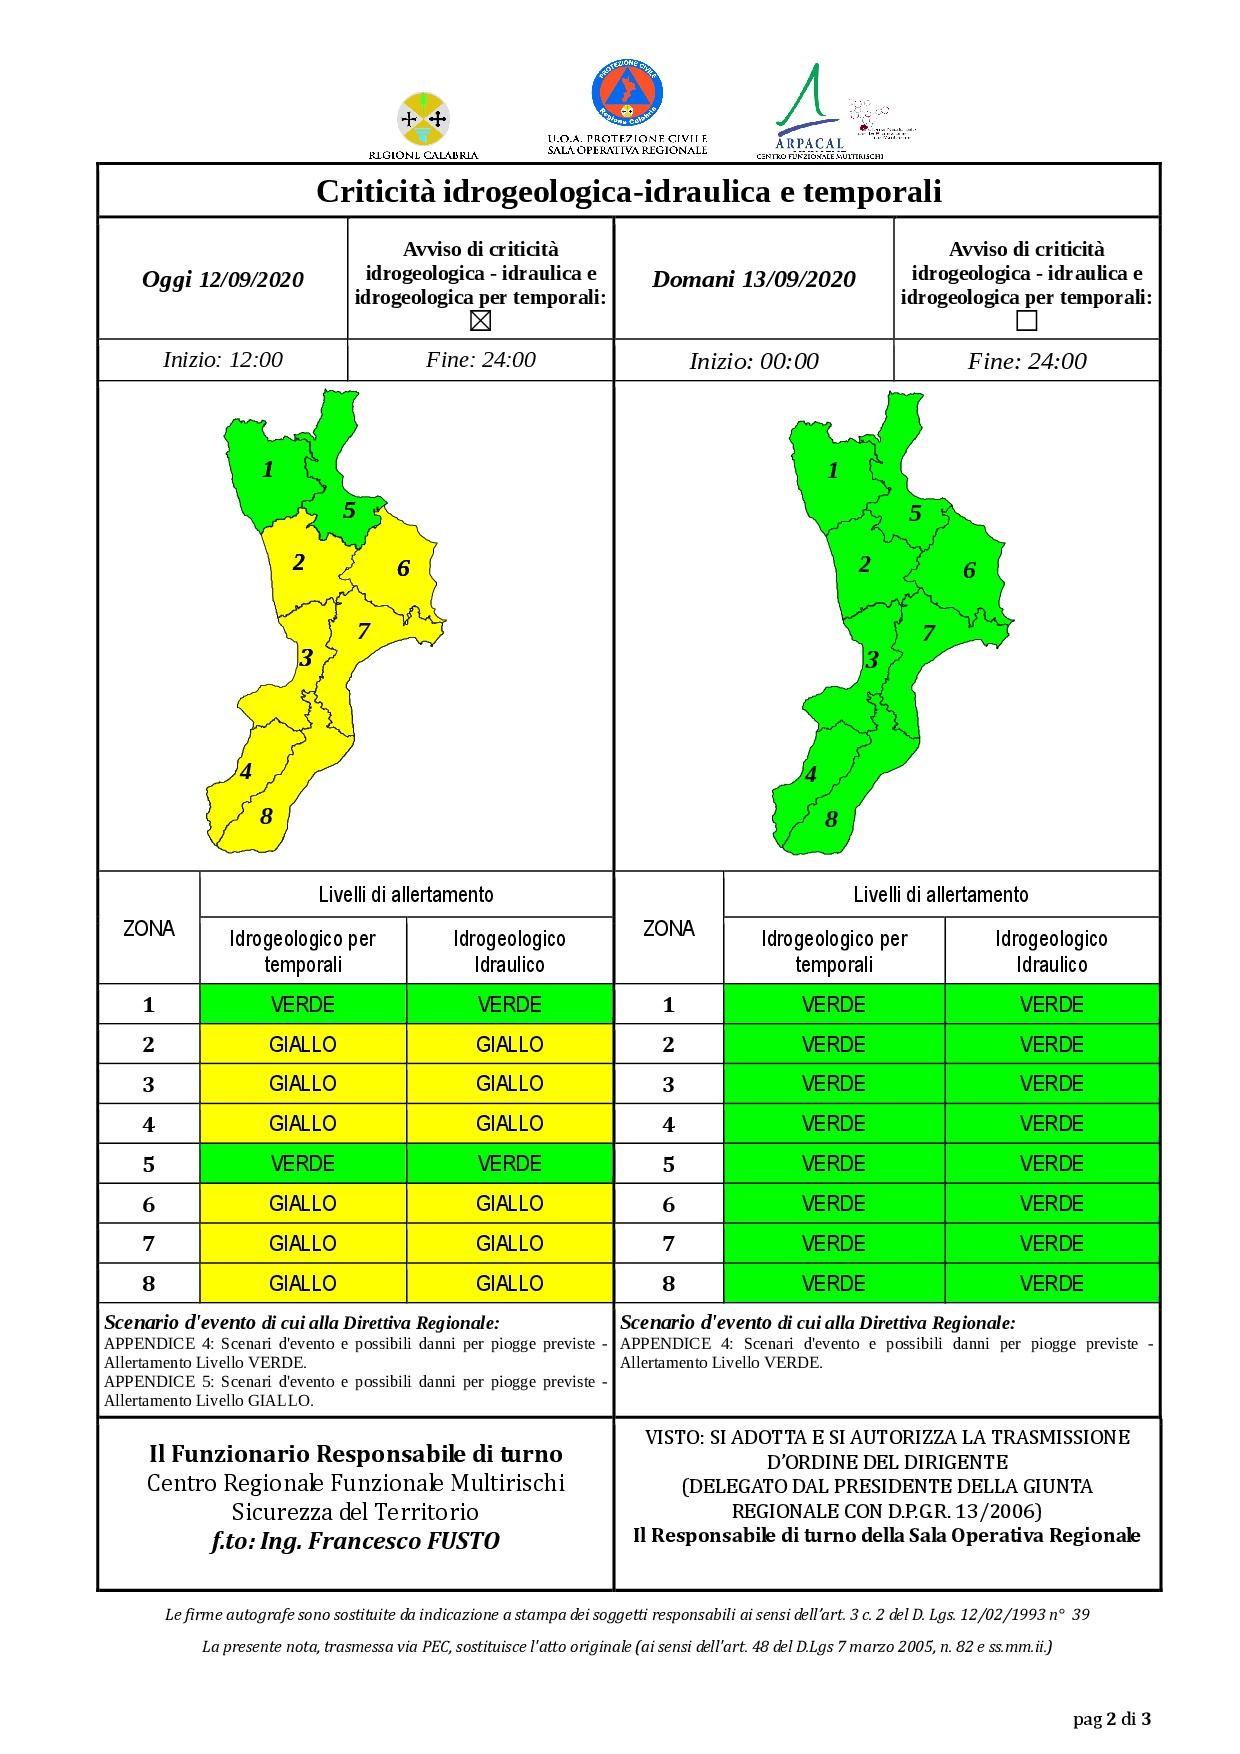 Criticità idrogeologica-idraulica e temporali in Calabria 12-09-2020